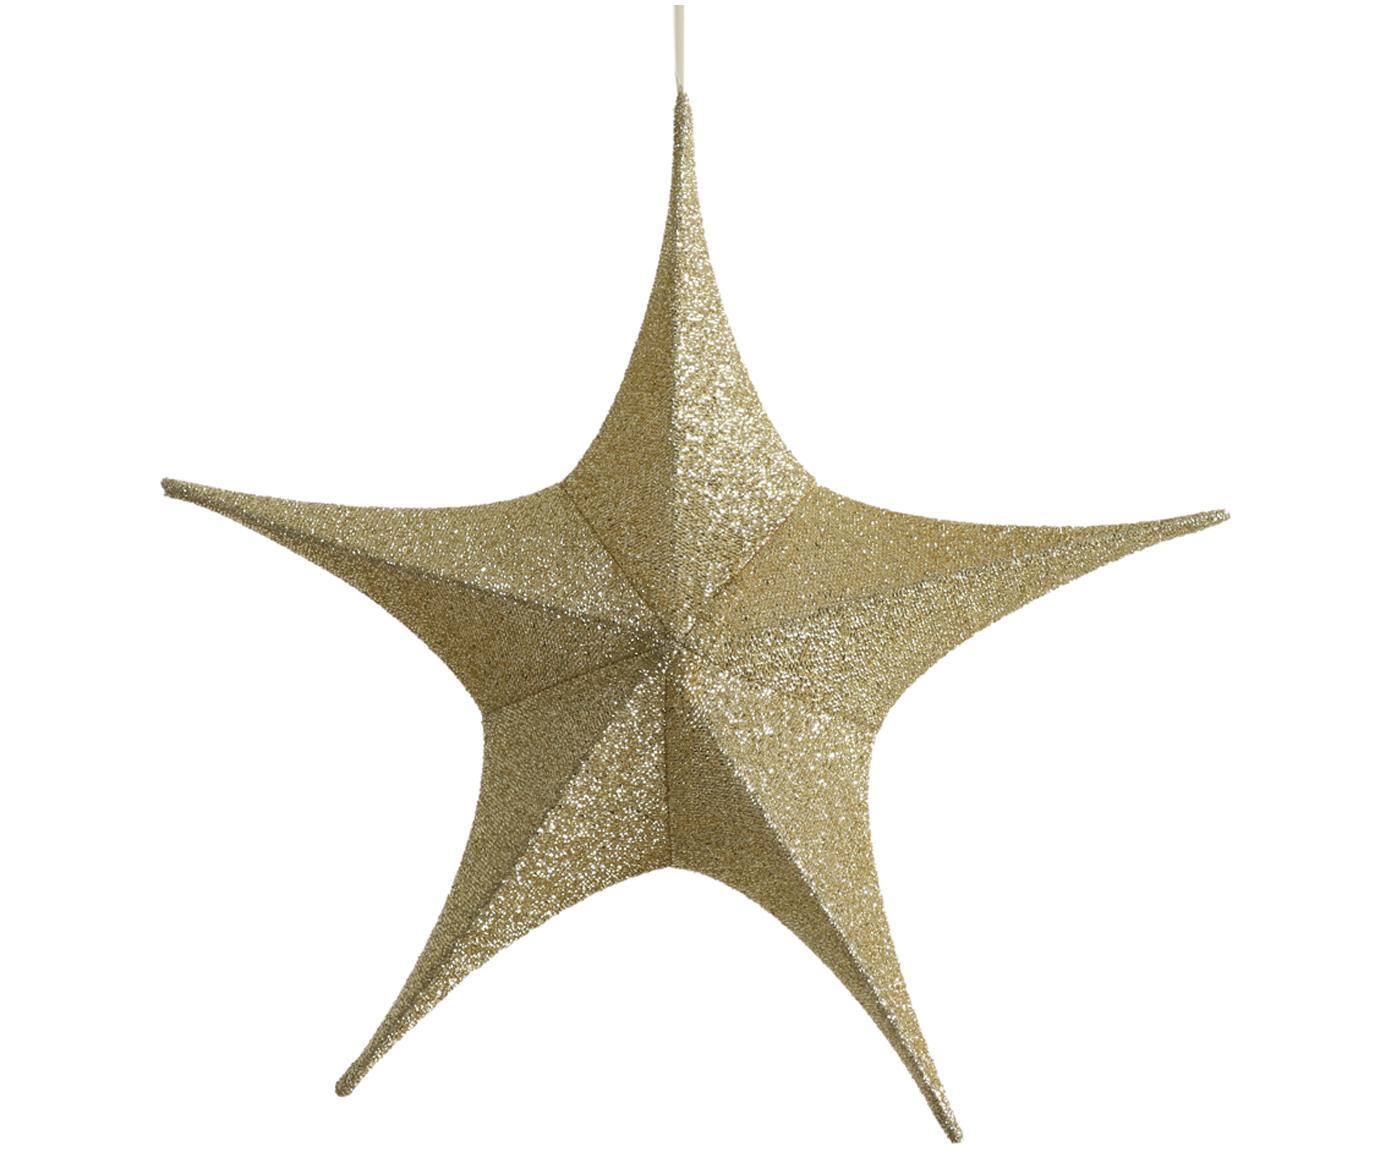 Decoratieve hanger Kamilla, Bekleding: polyester, Frame: metaal, Goudkleurig, 65 x 60 cm